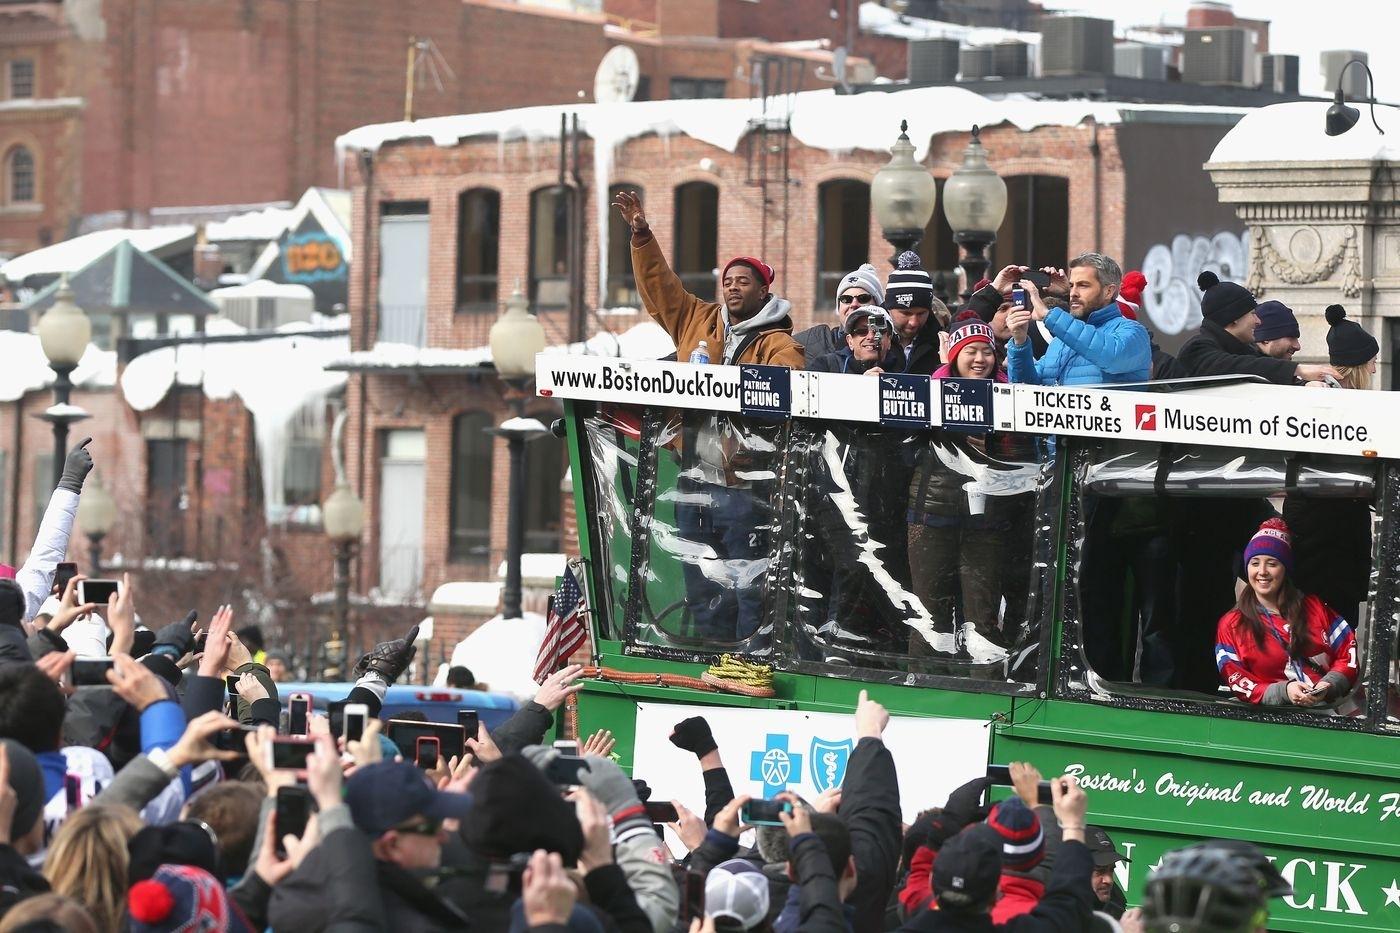 Patriots Super Bowl Parade 2017: Map, Route, And Road inside Atlanta Super Bowl Road Closures Map